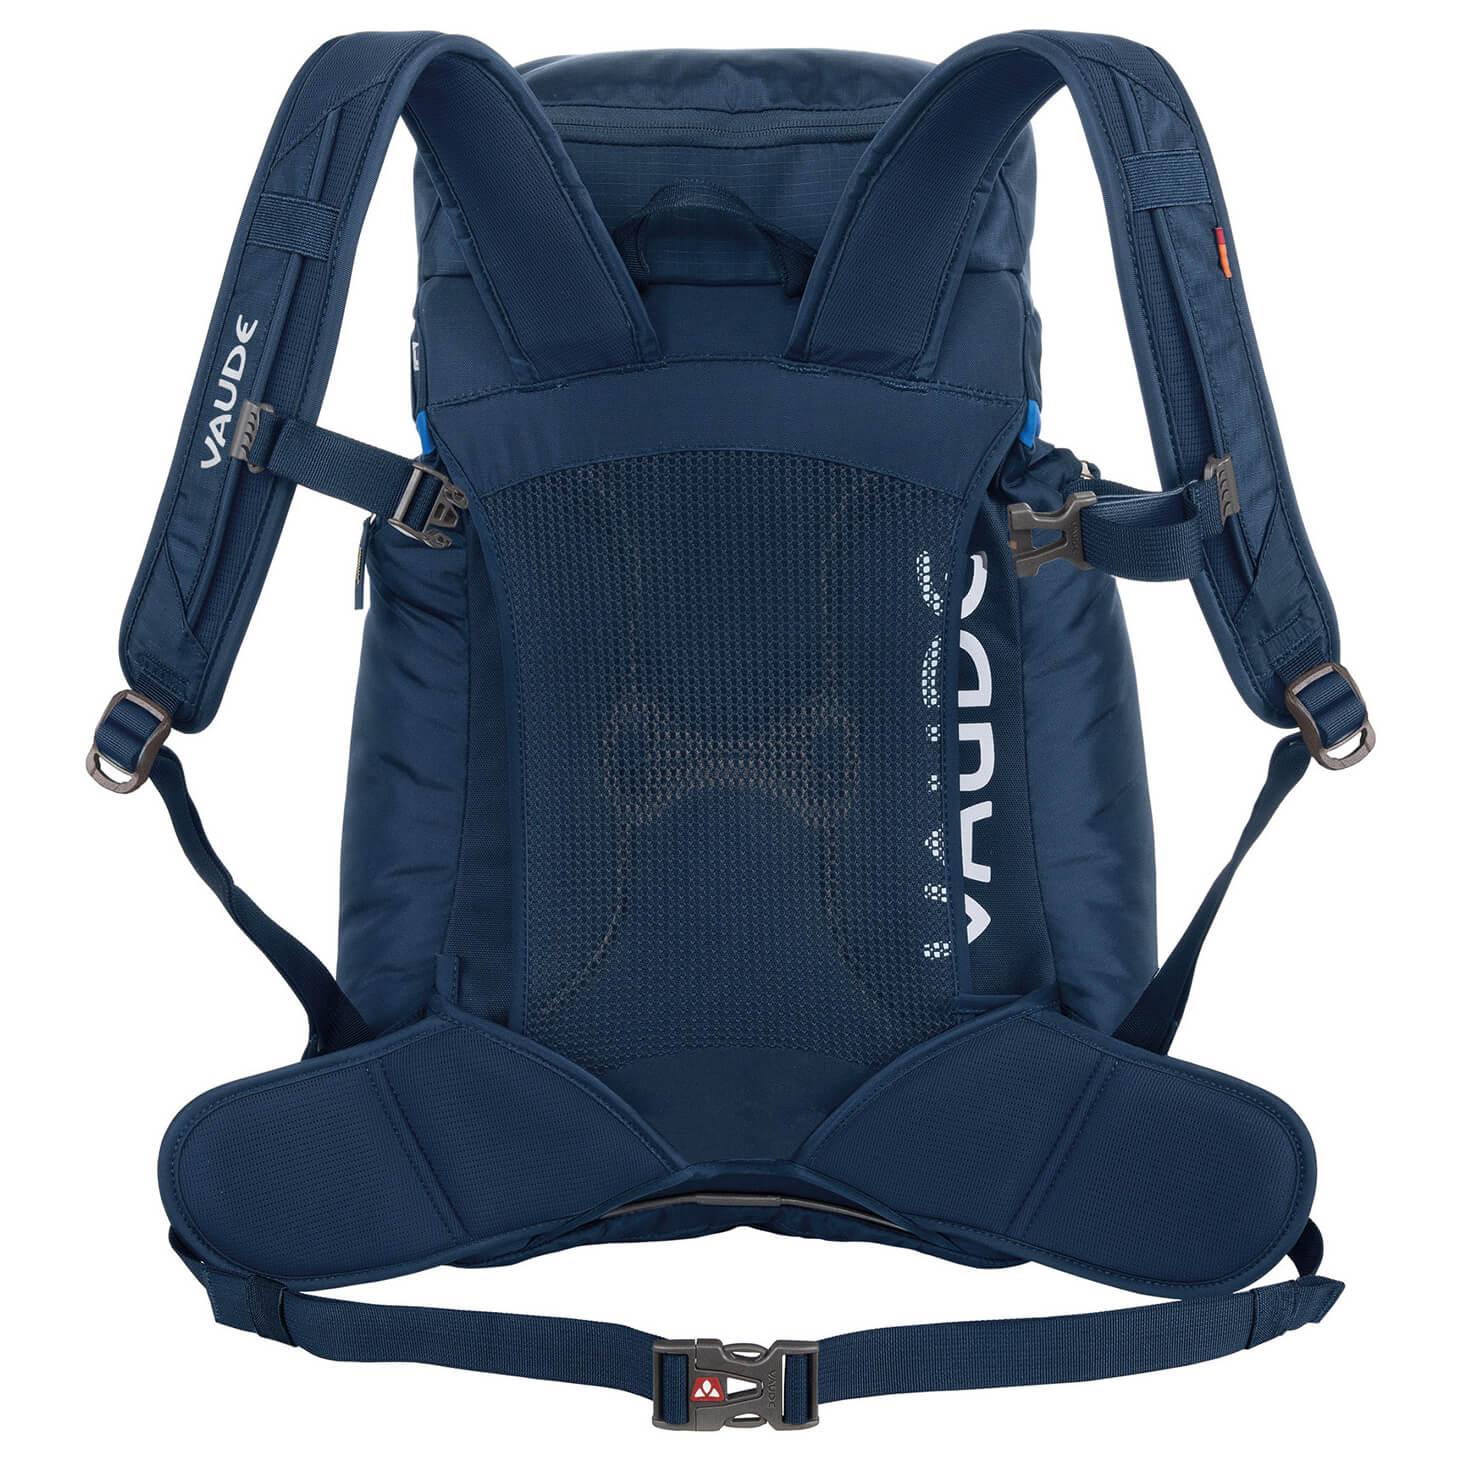 Vaude - Jura 32 - Wanderrucksack online kaufen